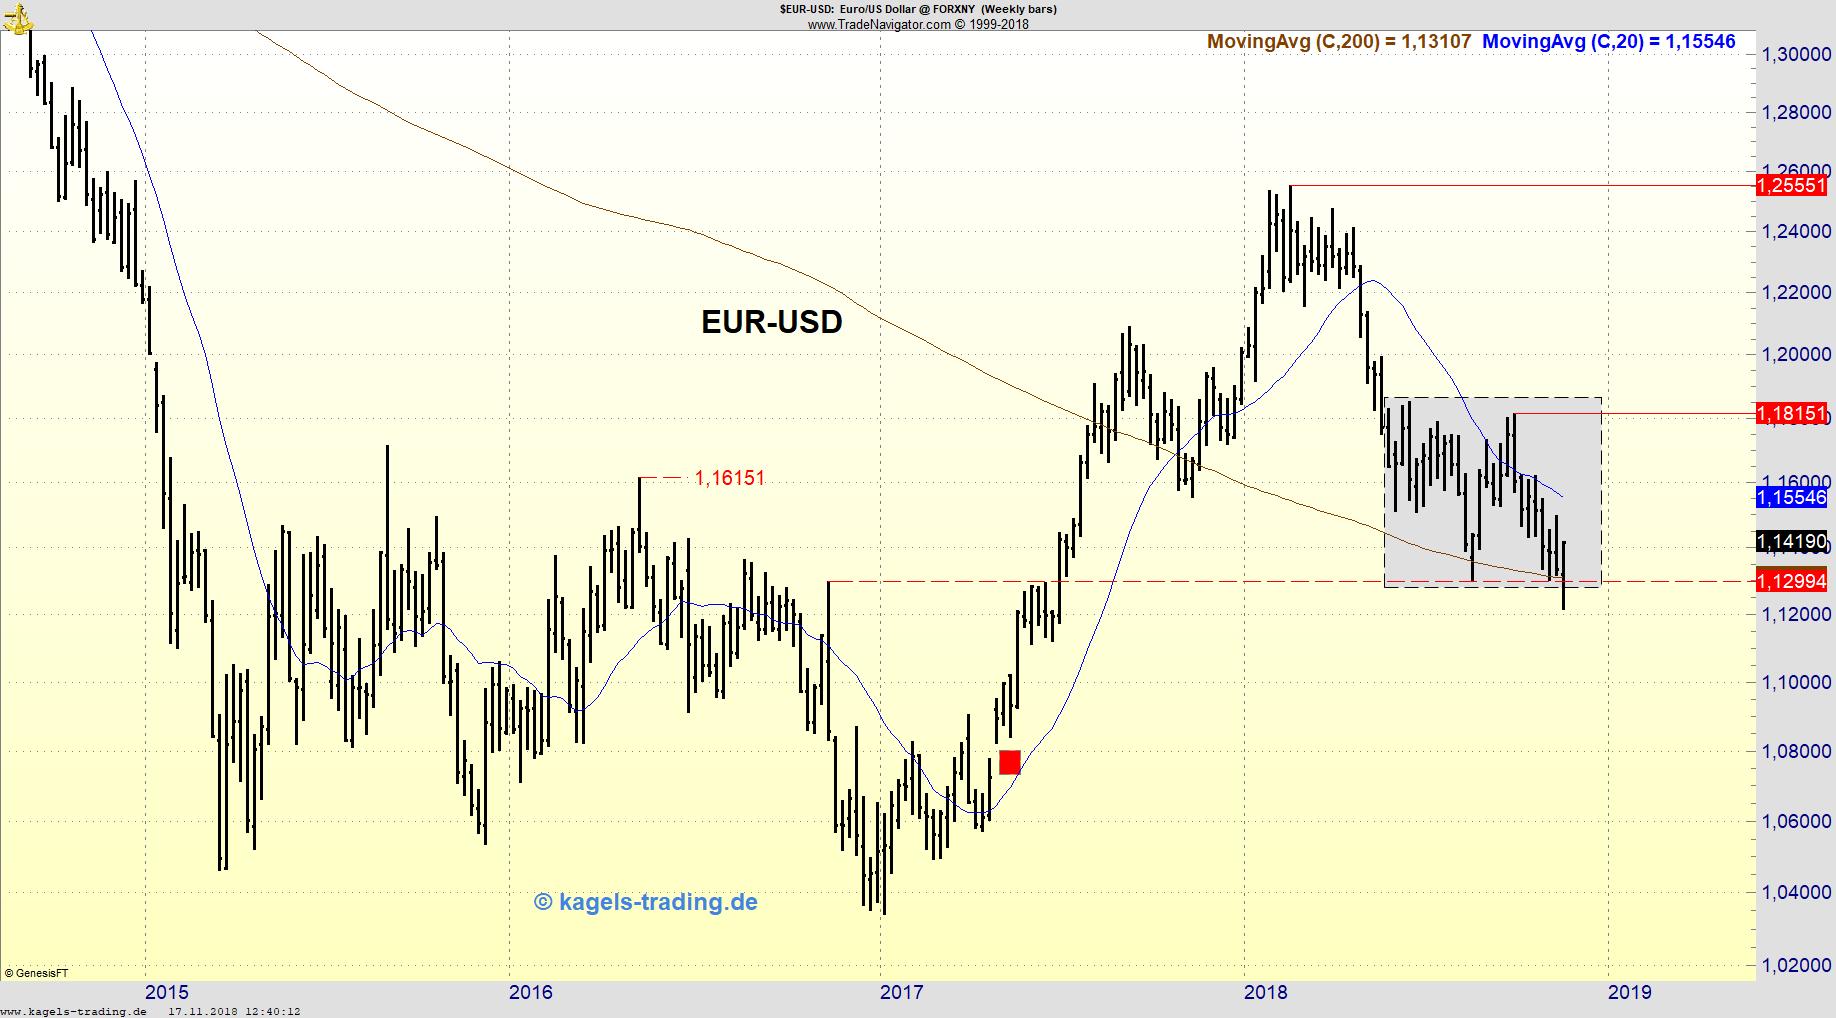 EUR/USD Wochenchart mit Trading-Range